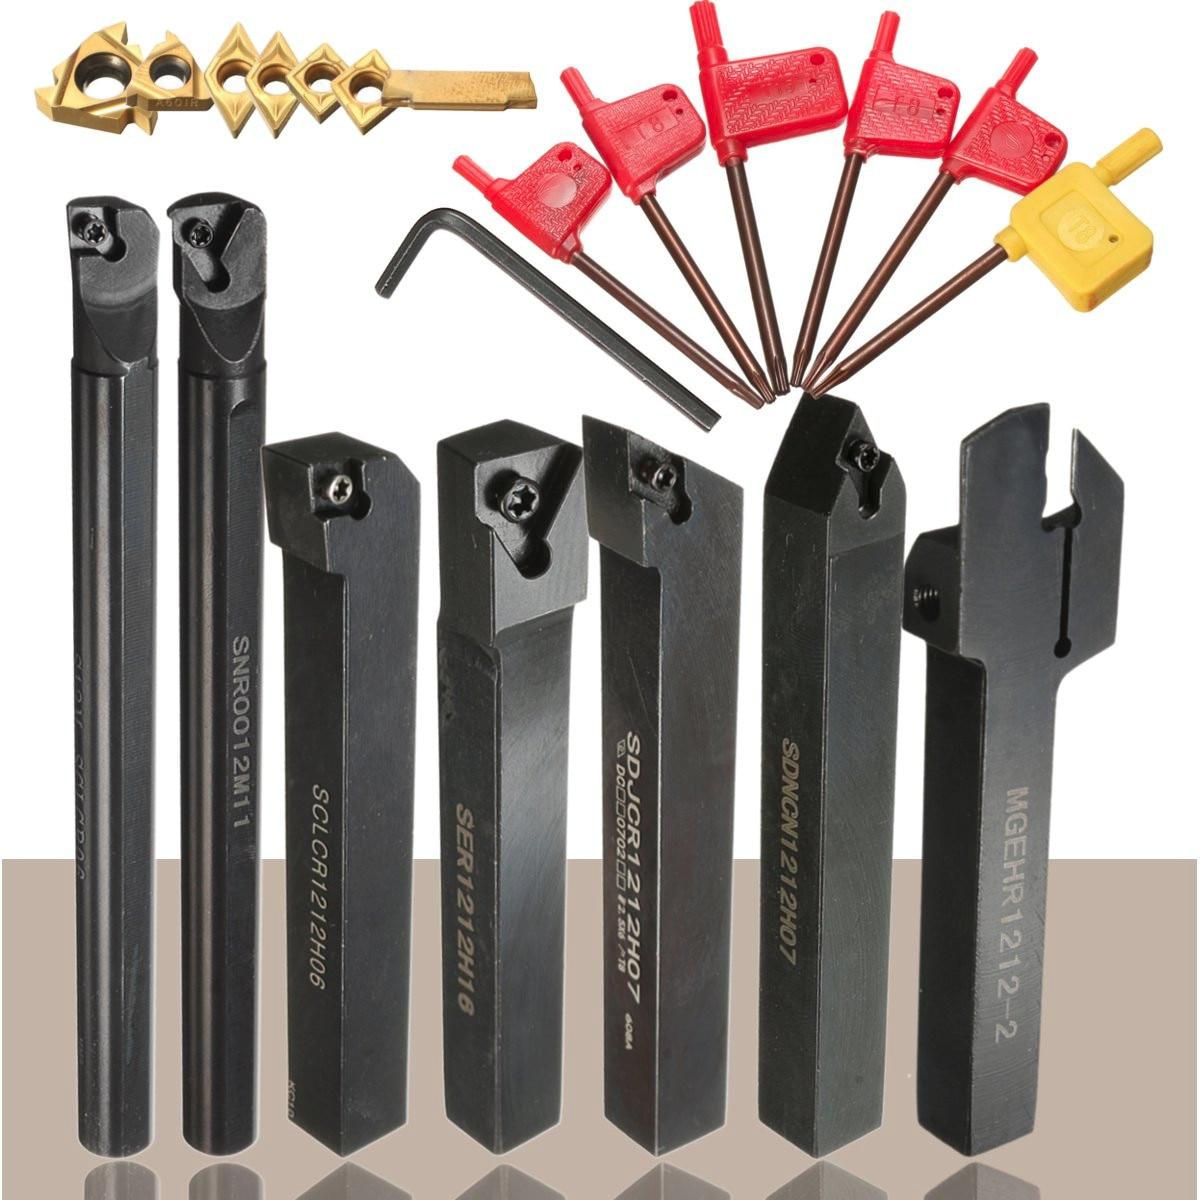 7pcs Turning Tool Holder Set 12mm Shank Lathe Boring Bar With Carbide Inserts + 7pcs Wrenches Tools Set 7pcs dcmt ccmt carbide inserts 7pcs tool holder boring bar with 7pcs wrenches for lathe turning tools